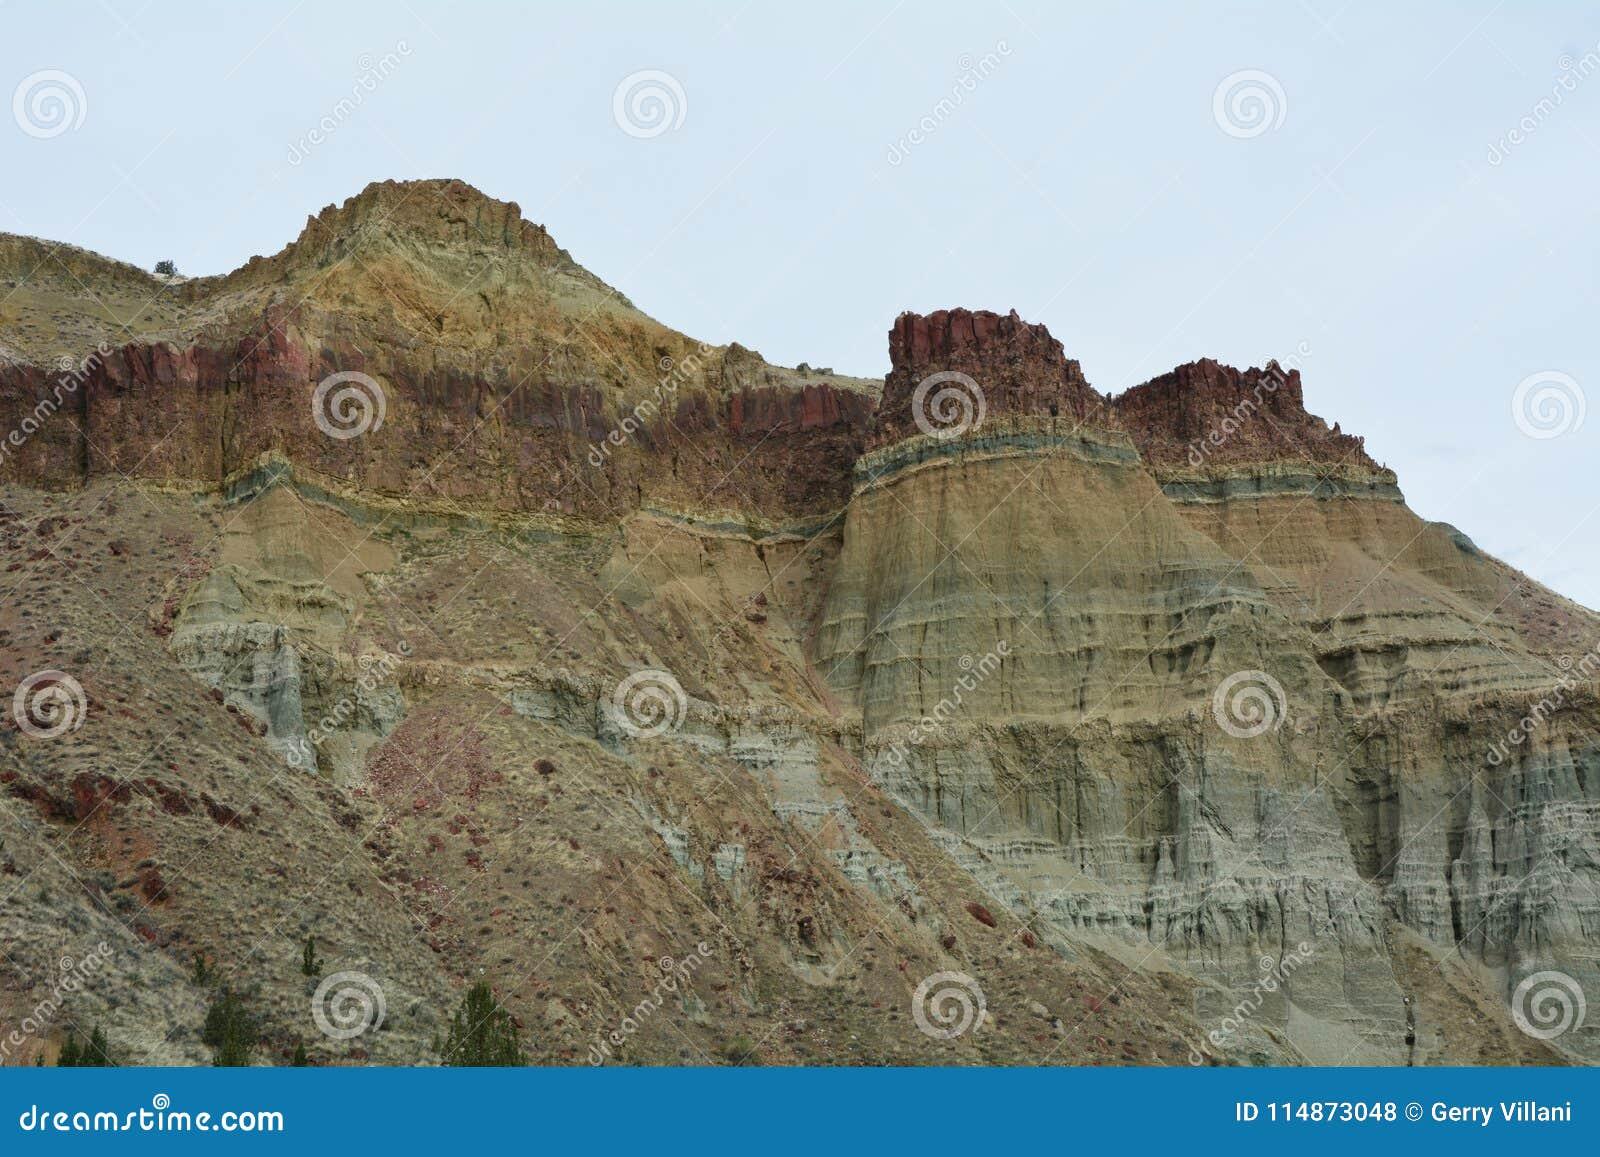 Cathedral Rock, Central Oregon Image 2